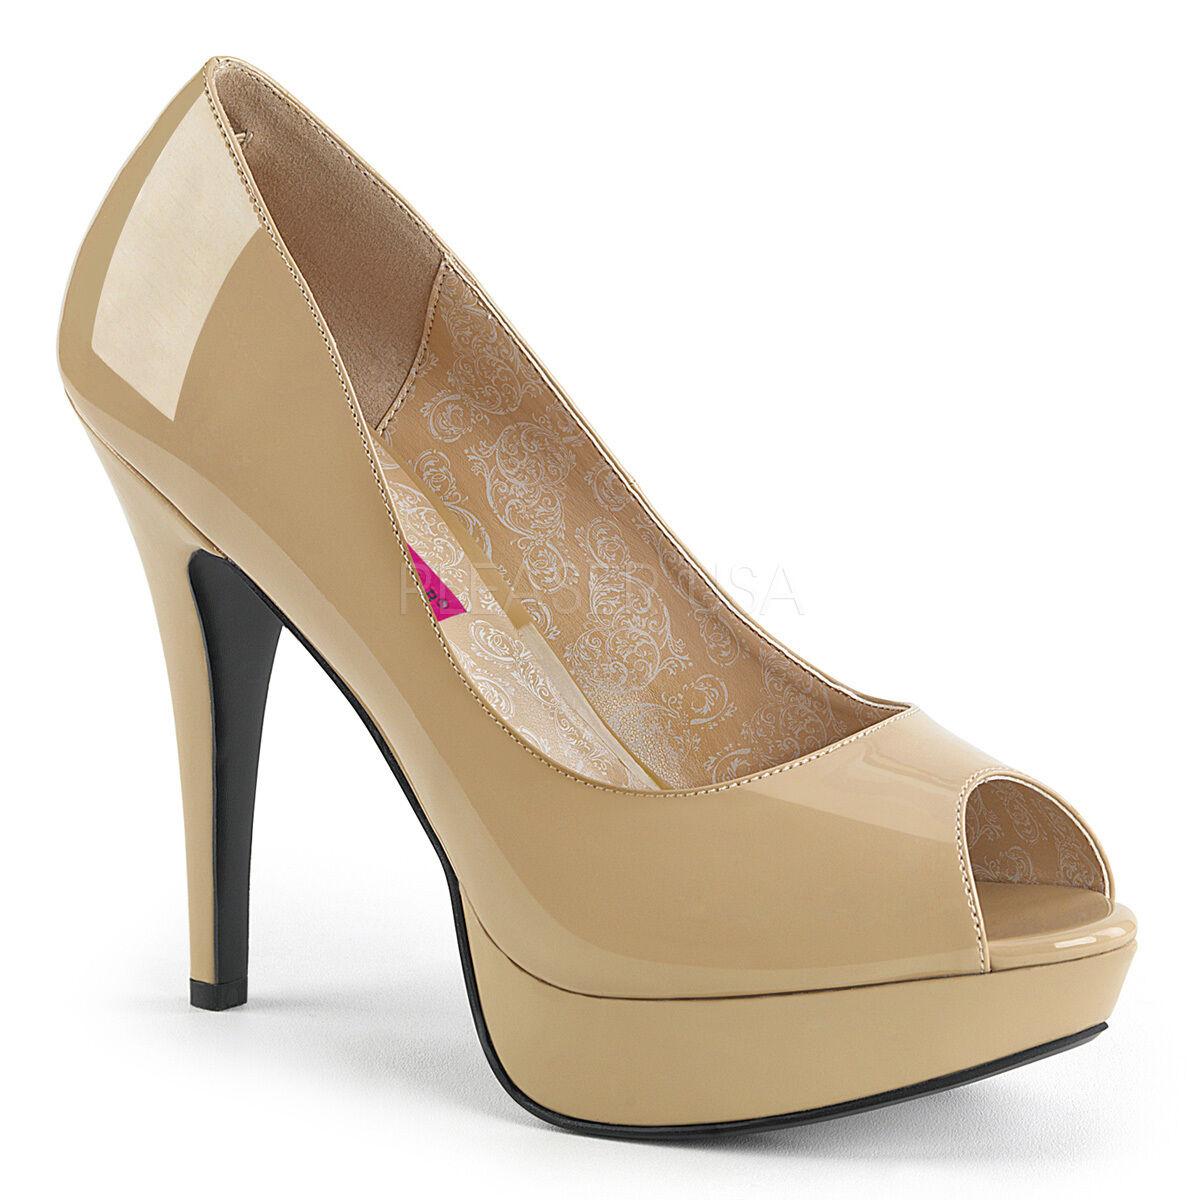 PLEASER Sexy 5 5 5 1 4  High Heel Concealed Platform Cream Pump schuhe Large GrößeS 45e3e1